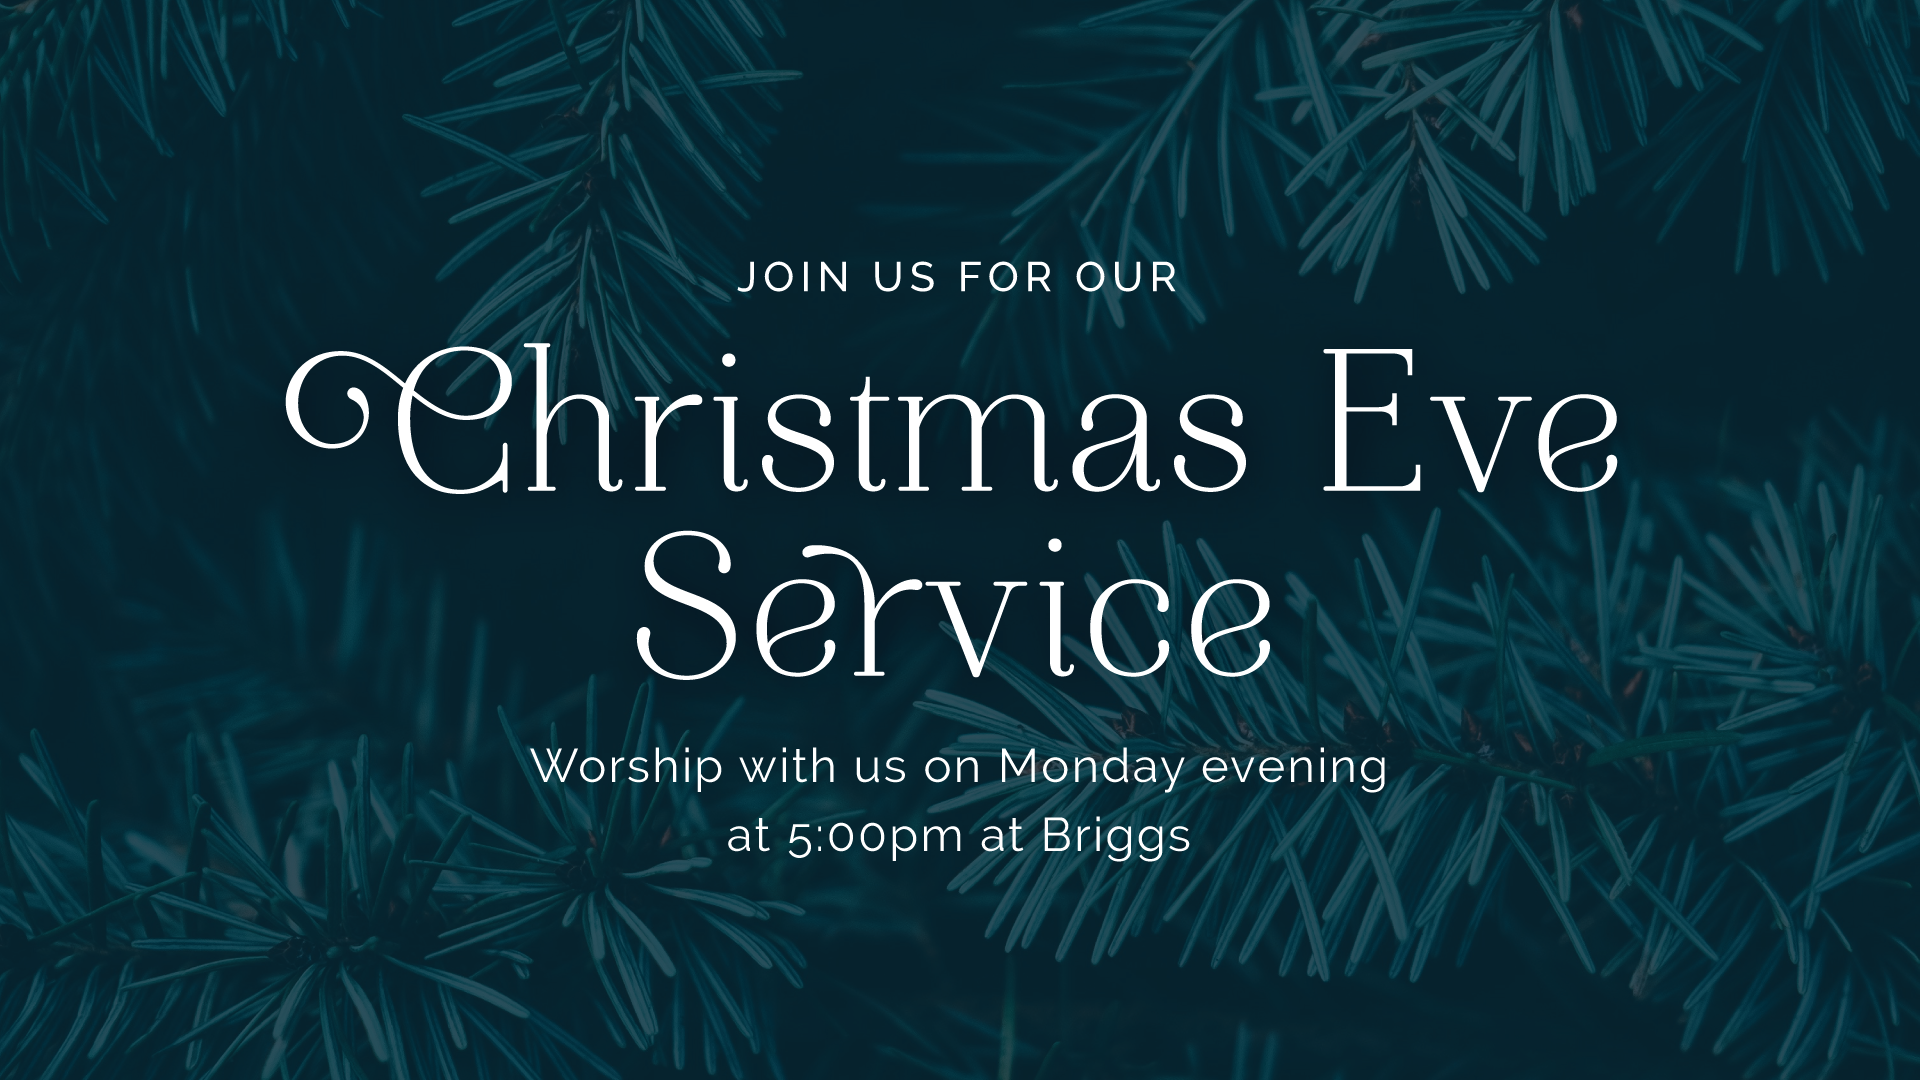 Christmas Eve Service - Good Shepherd Presbyterian Church PCA - Florence, SC